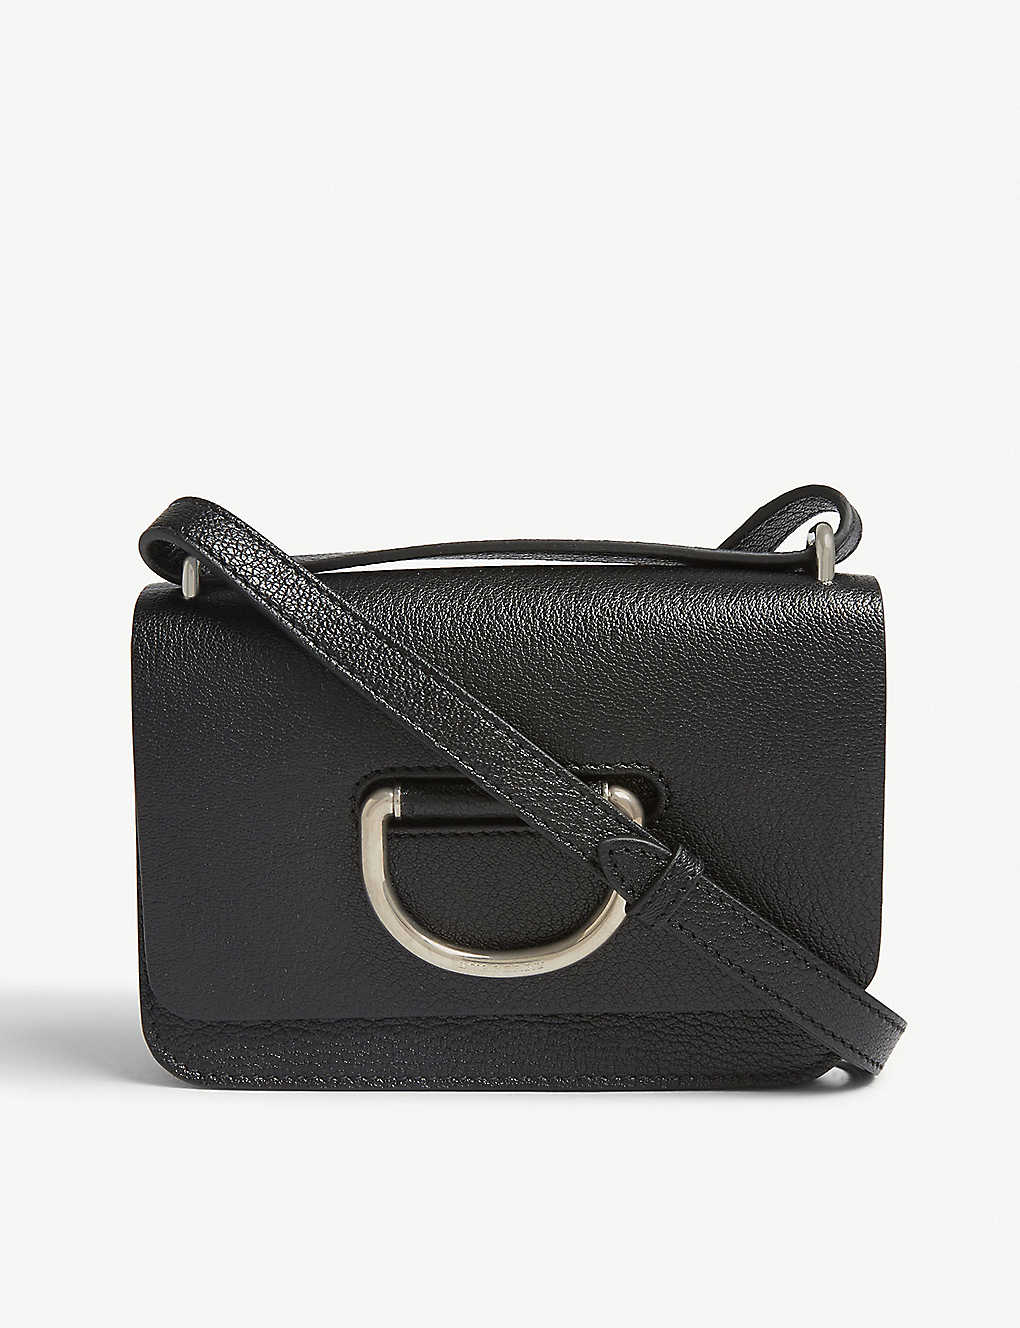 Body Mini Burberry Bag D Leather Ring Cross dXqwzxq